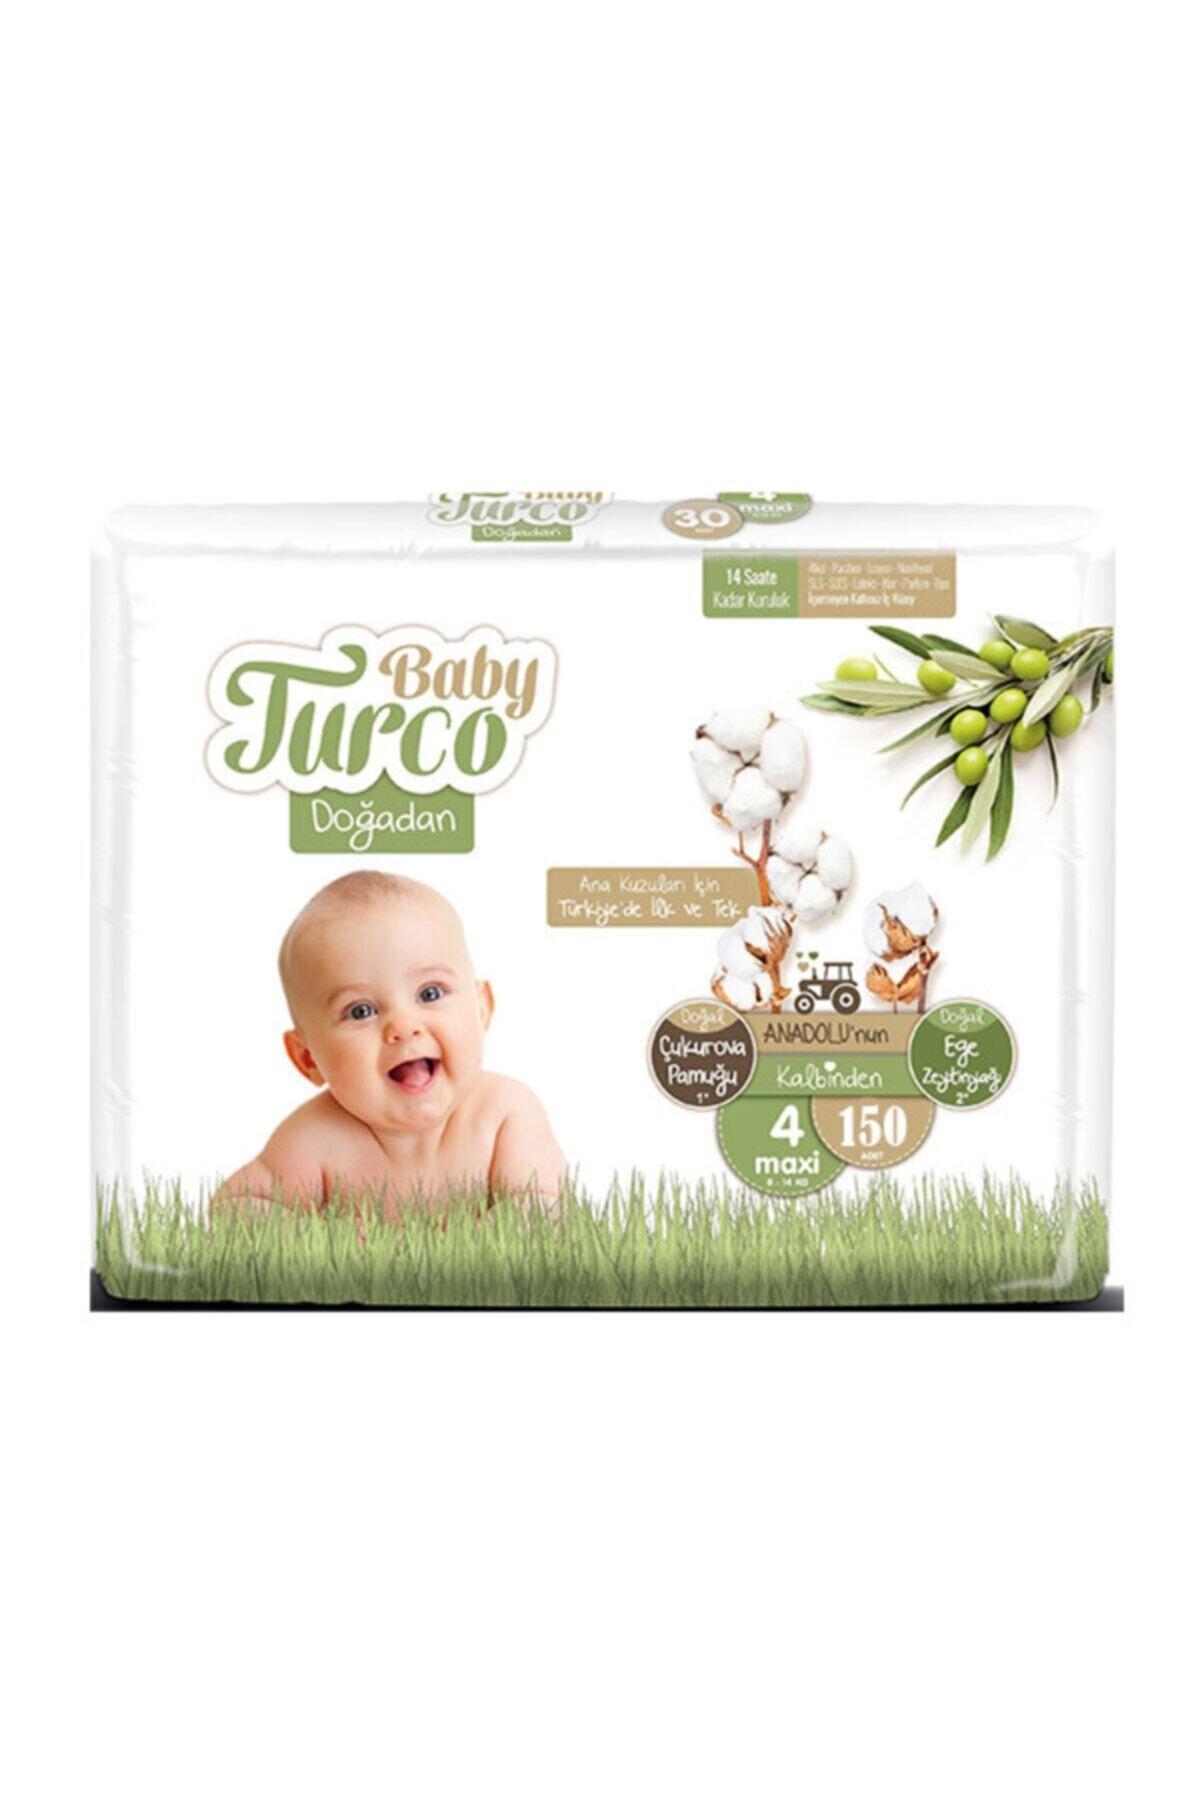 Baby Turco Doğadan 4 Numara Maxi 150 Adet 8-14 Kg 1